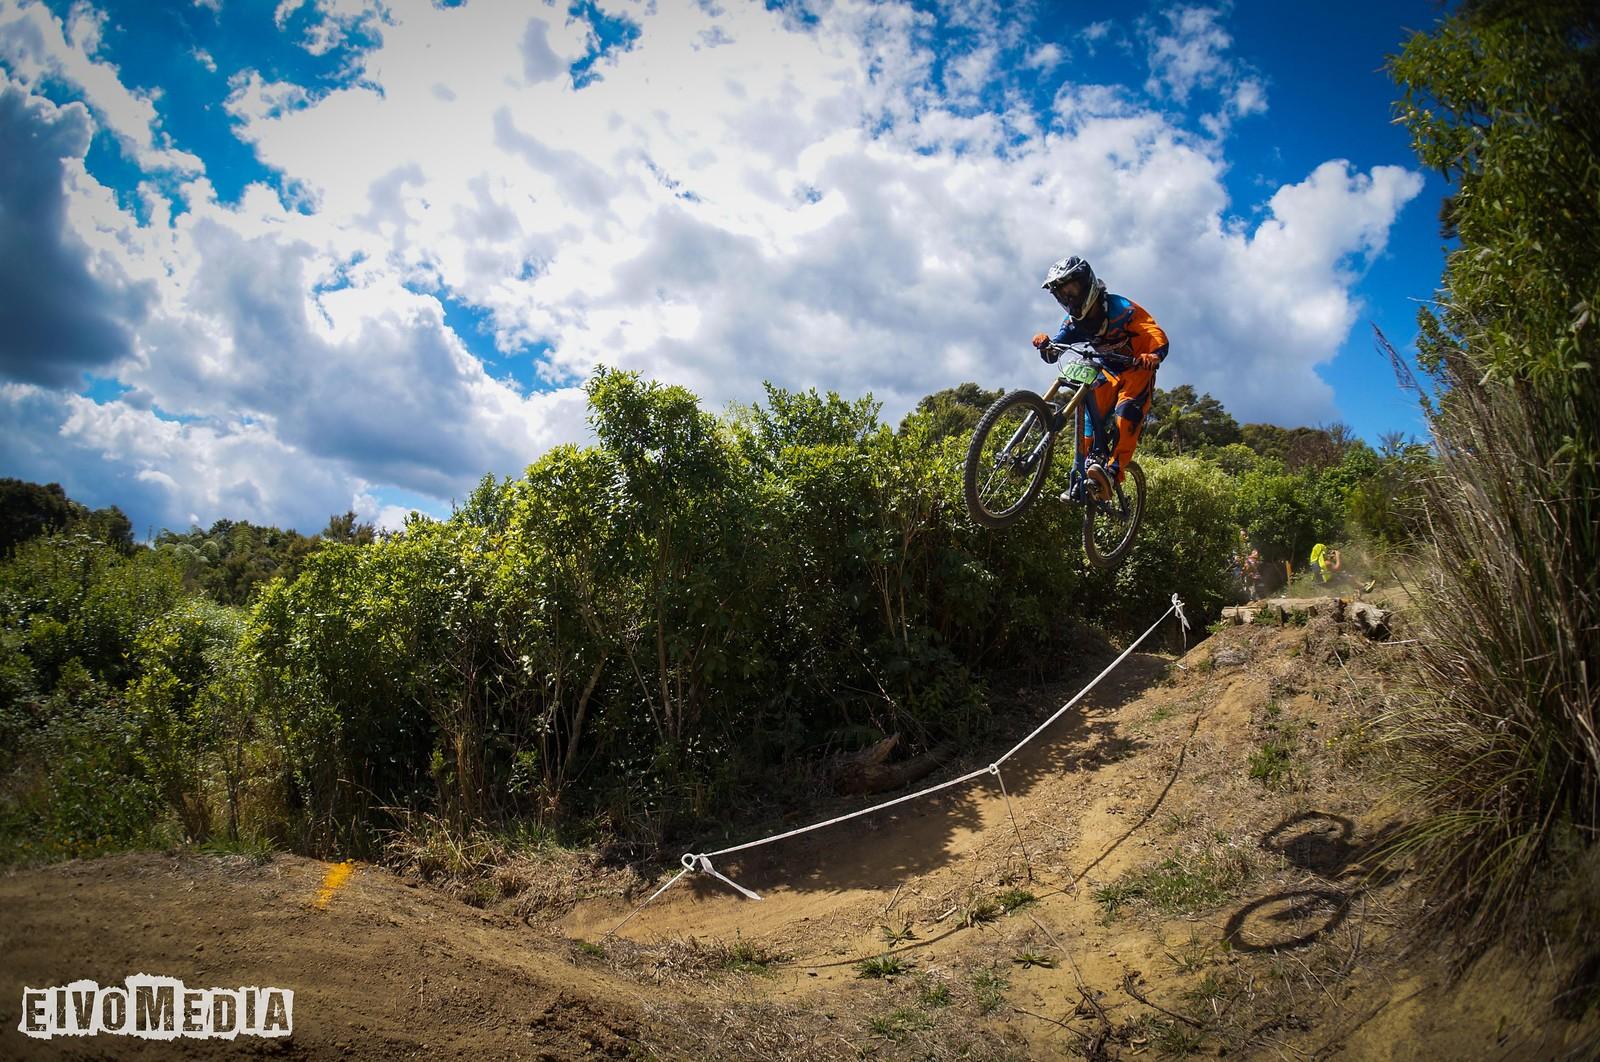 Hunua DH - EIVOMEDIA - Mountain Biking Pictures - Vital MTB